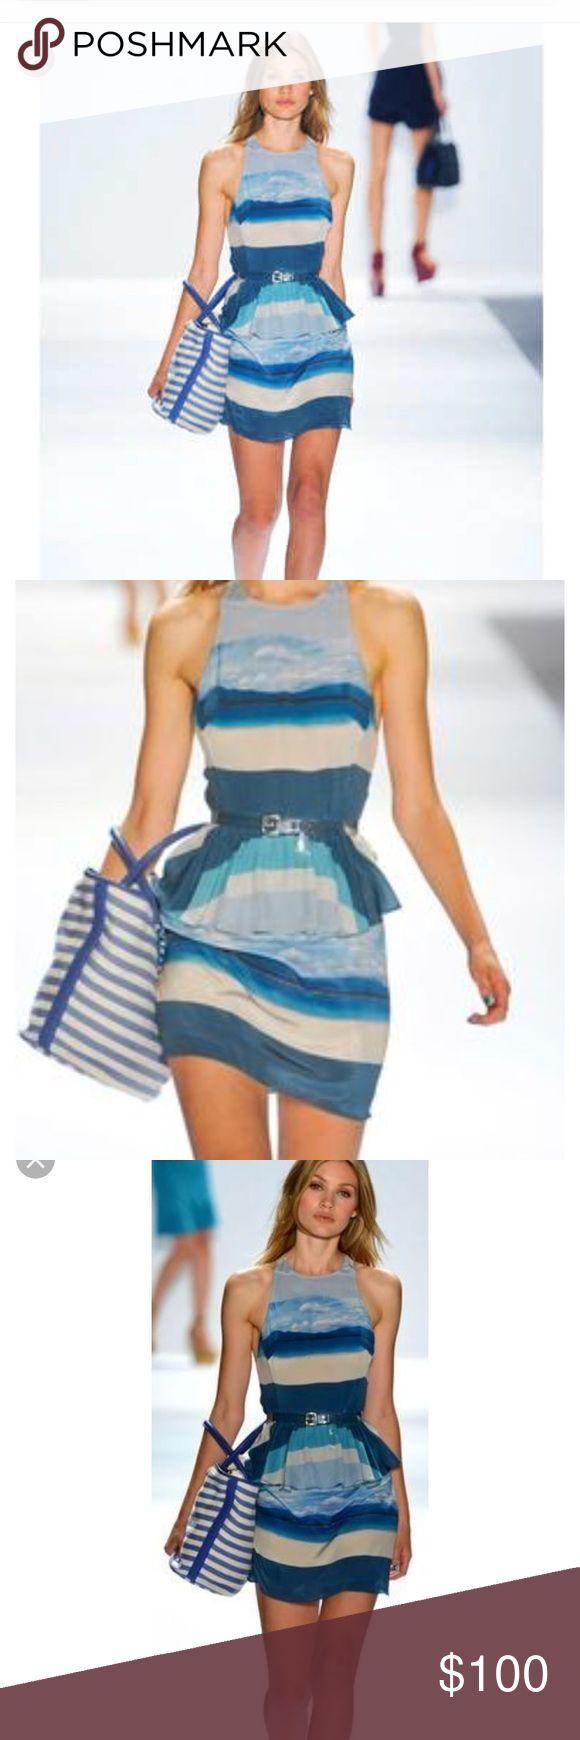 Charlotte Ronson Silk Dress Beautiful silk peplum mini dress . Excellent condition. Only worn twice! Charlotte Ronson Dresses Mini